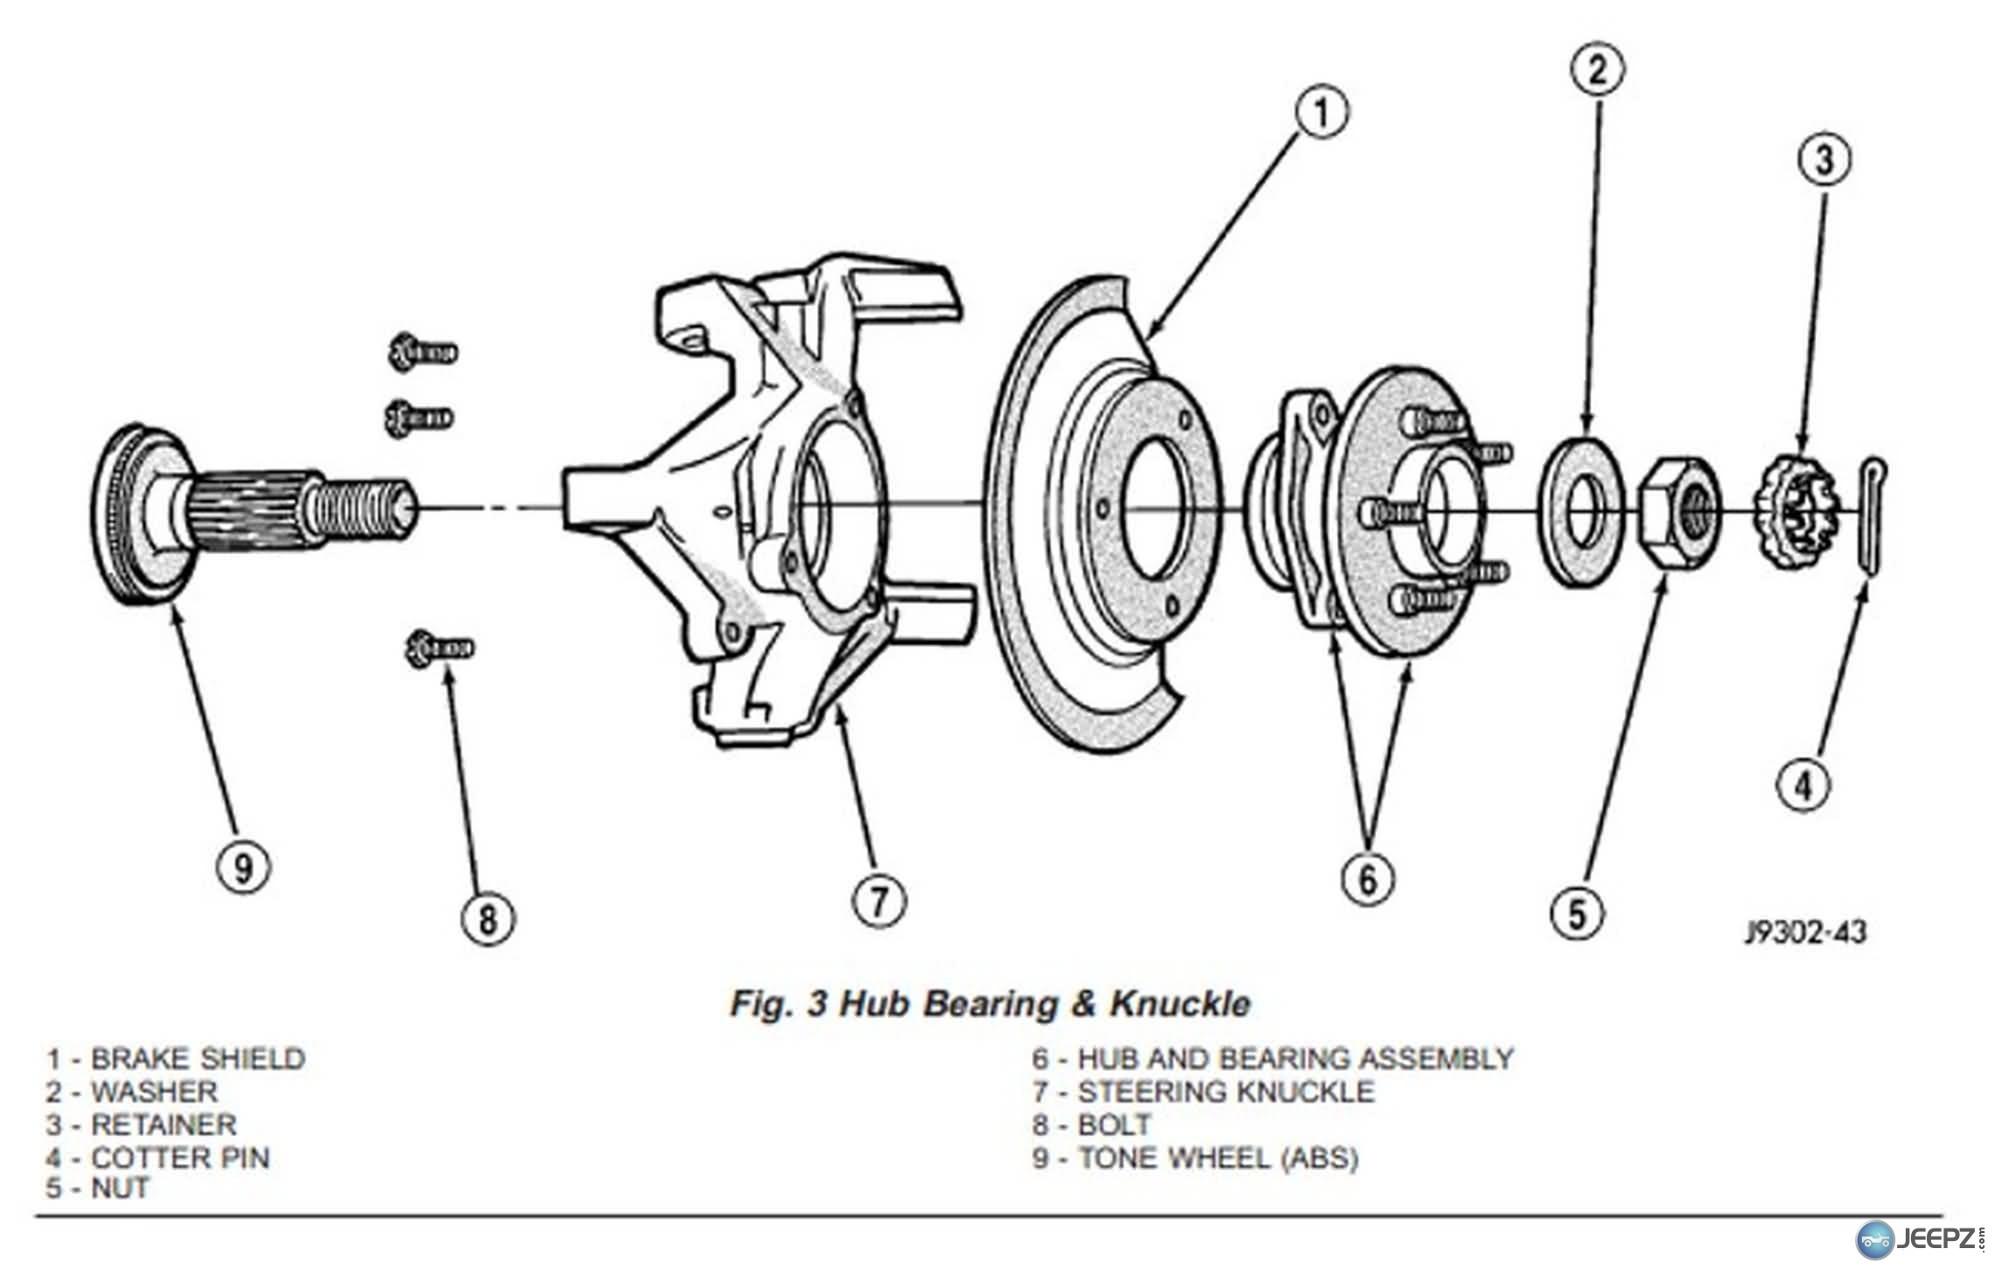 trailer wheel hub assembly diagram bantam t3 c converting hubs to 5 rh detoxicrecenze com front wheel hub assembly diagram front wheel hub assembly diagram